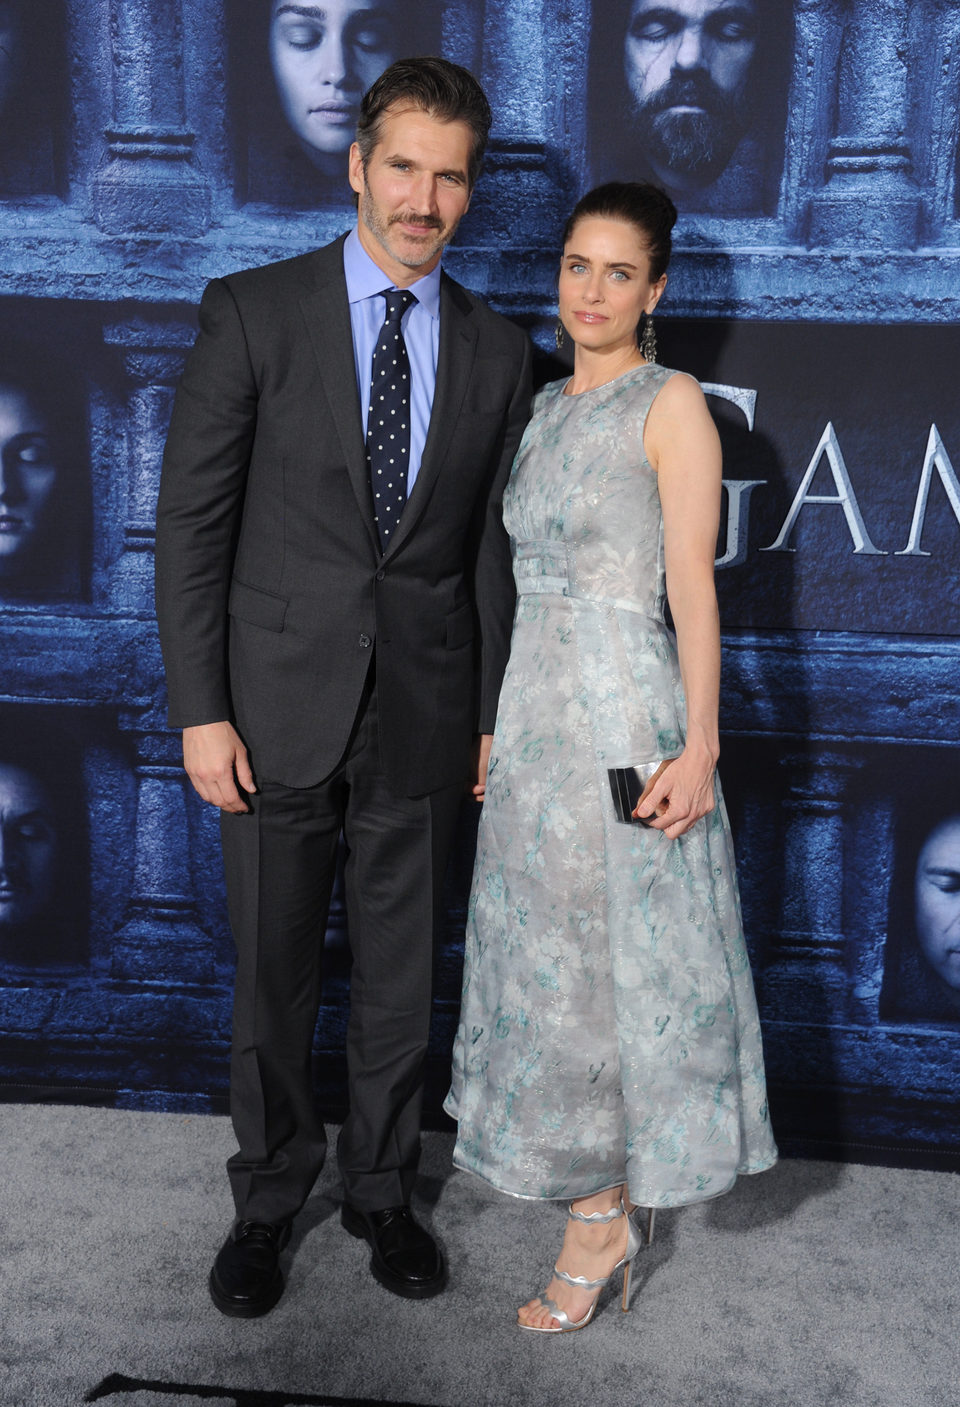 Amanda Peet and David Benioff at the premiere of 'Game of Thrones' Season Six